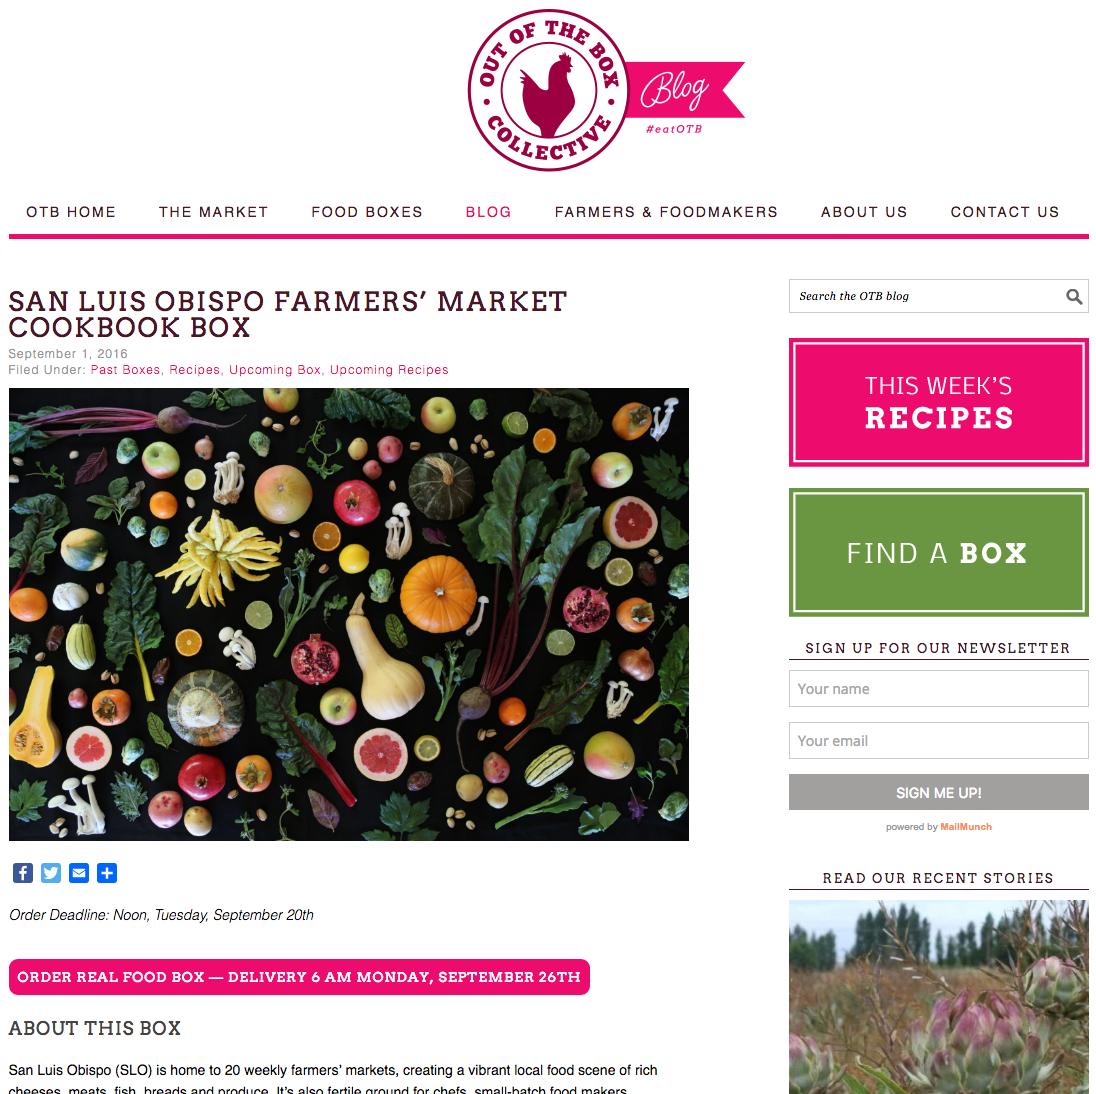 http://blog.outoftheboxcollective.com/recipes/san-luis-obispo-farmers-market-cookbook-box/